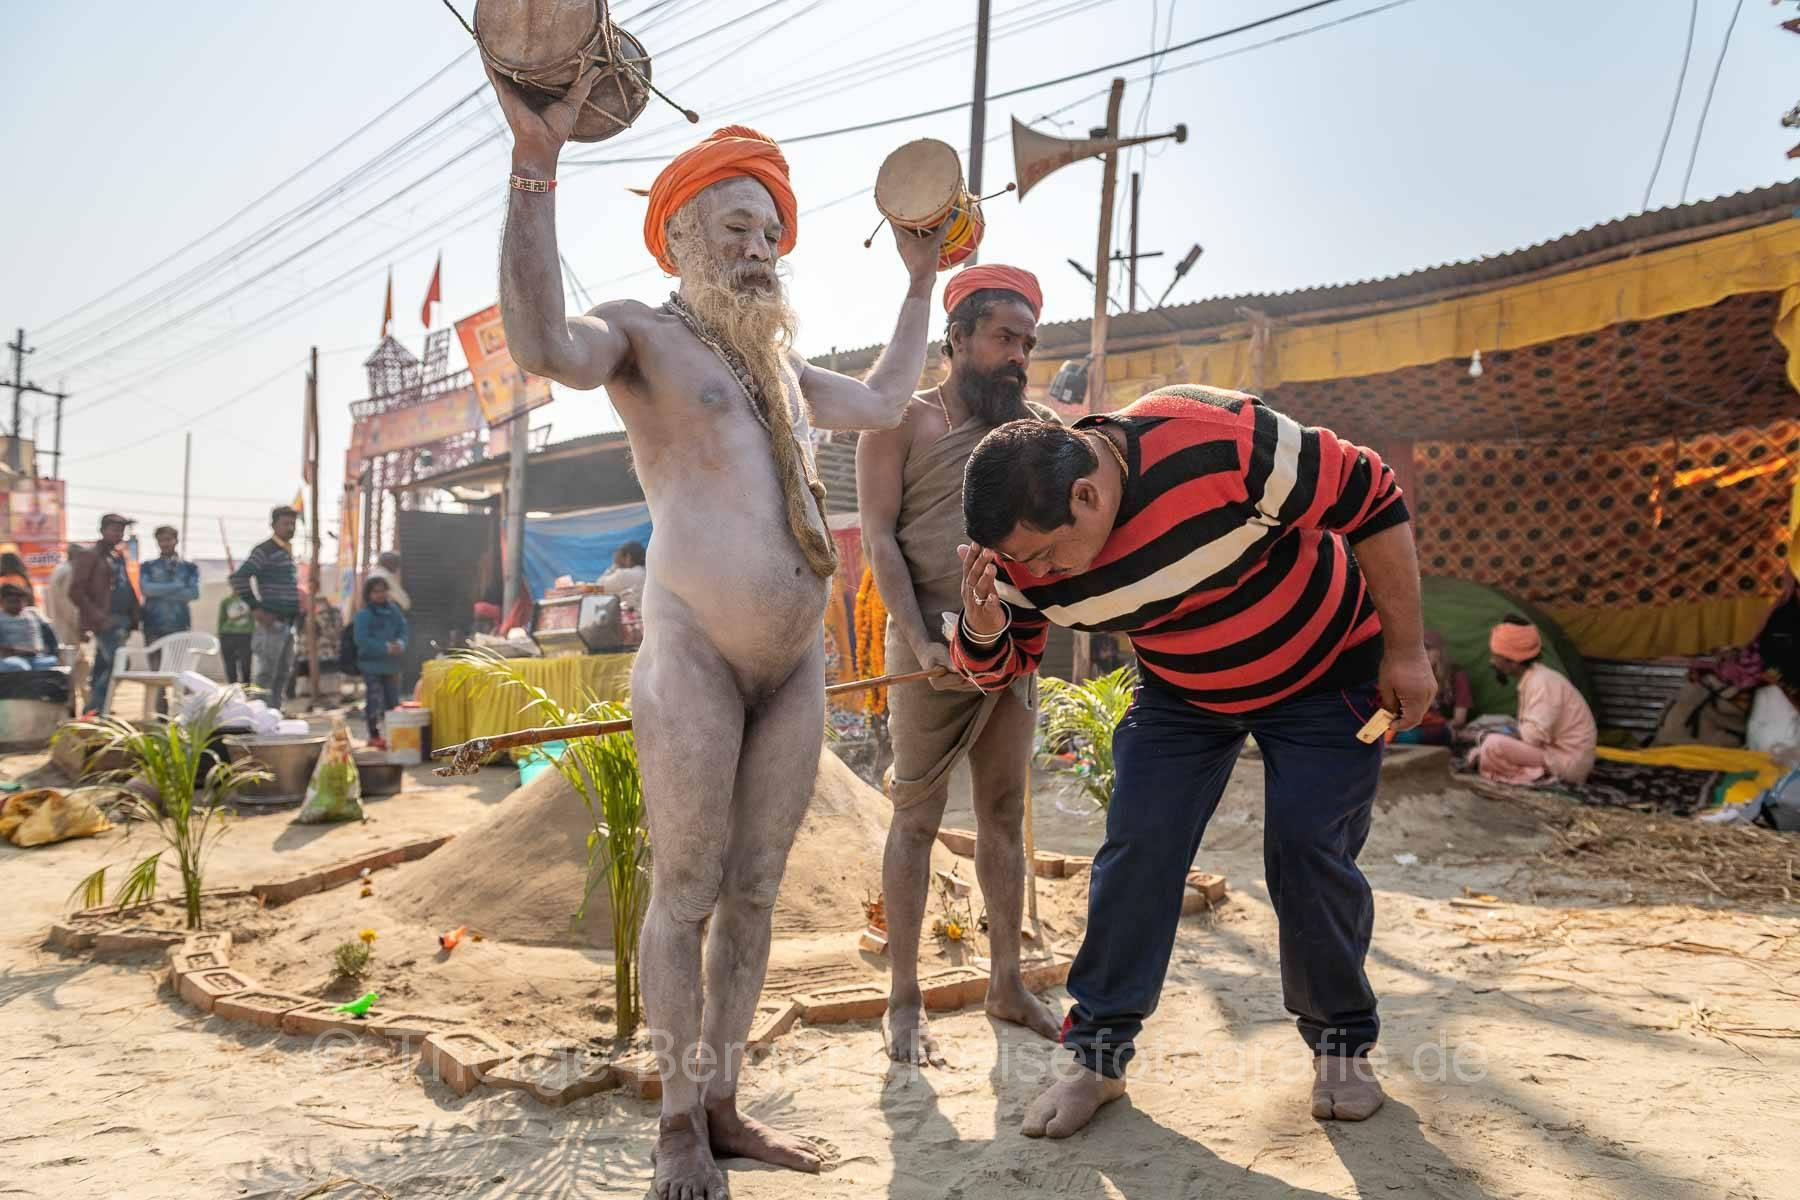 Mann verbeugt sich vor Sadhu - Ardth Kumbh Mela 2019 in Prayagraj